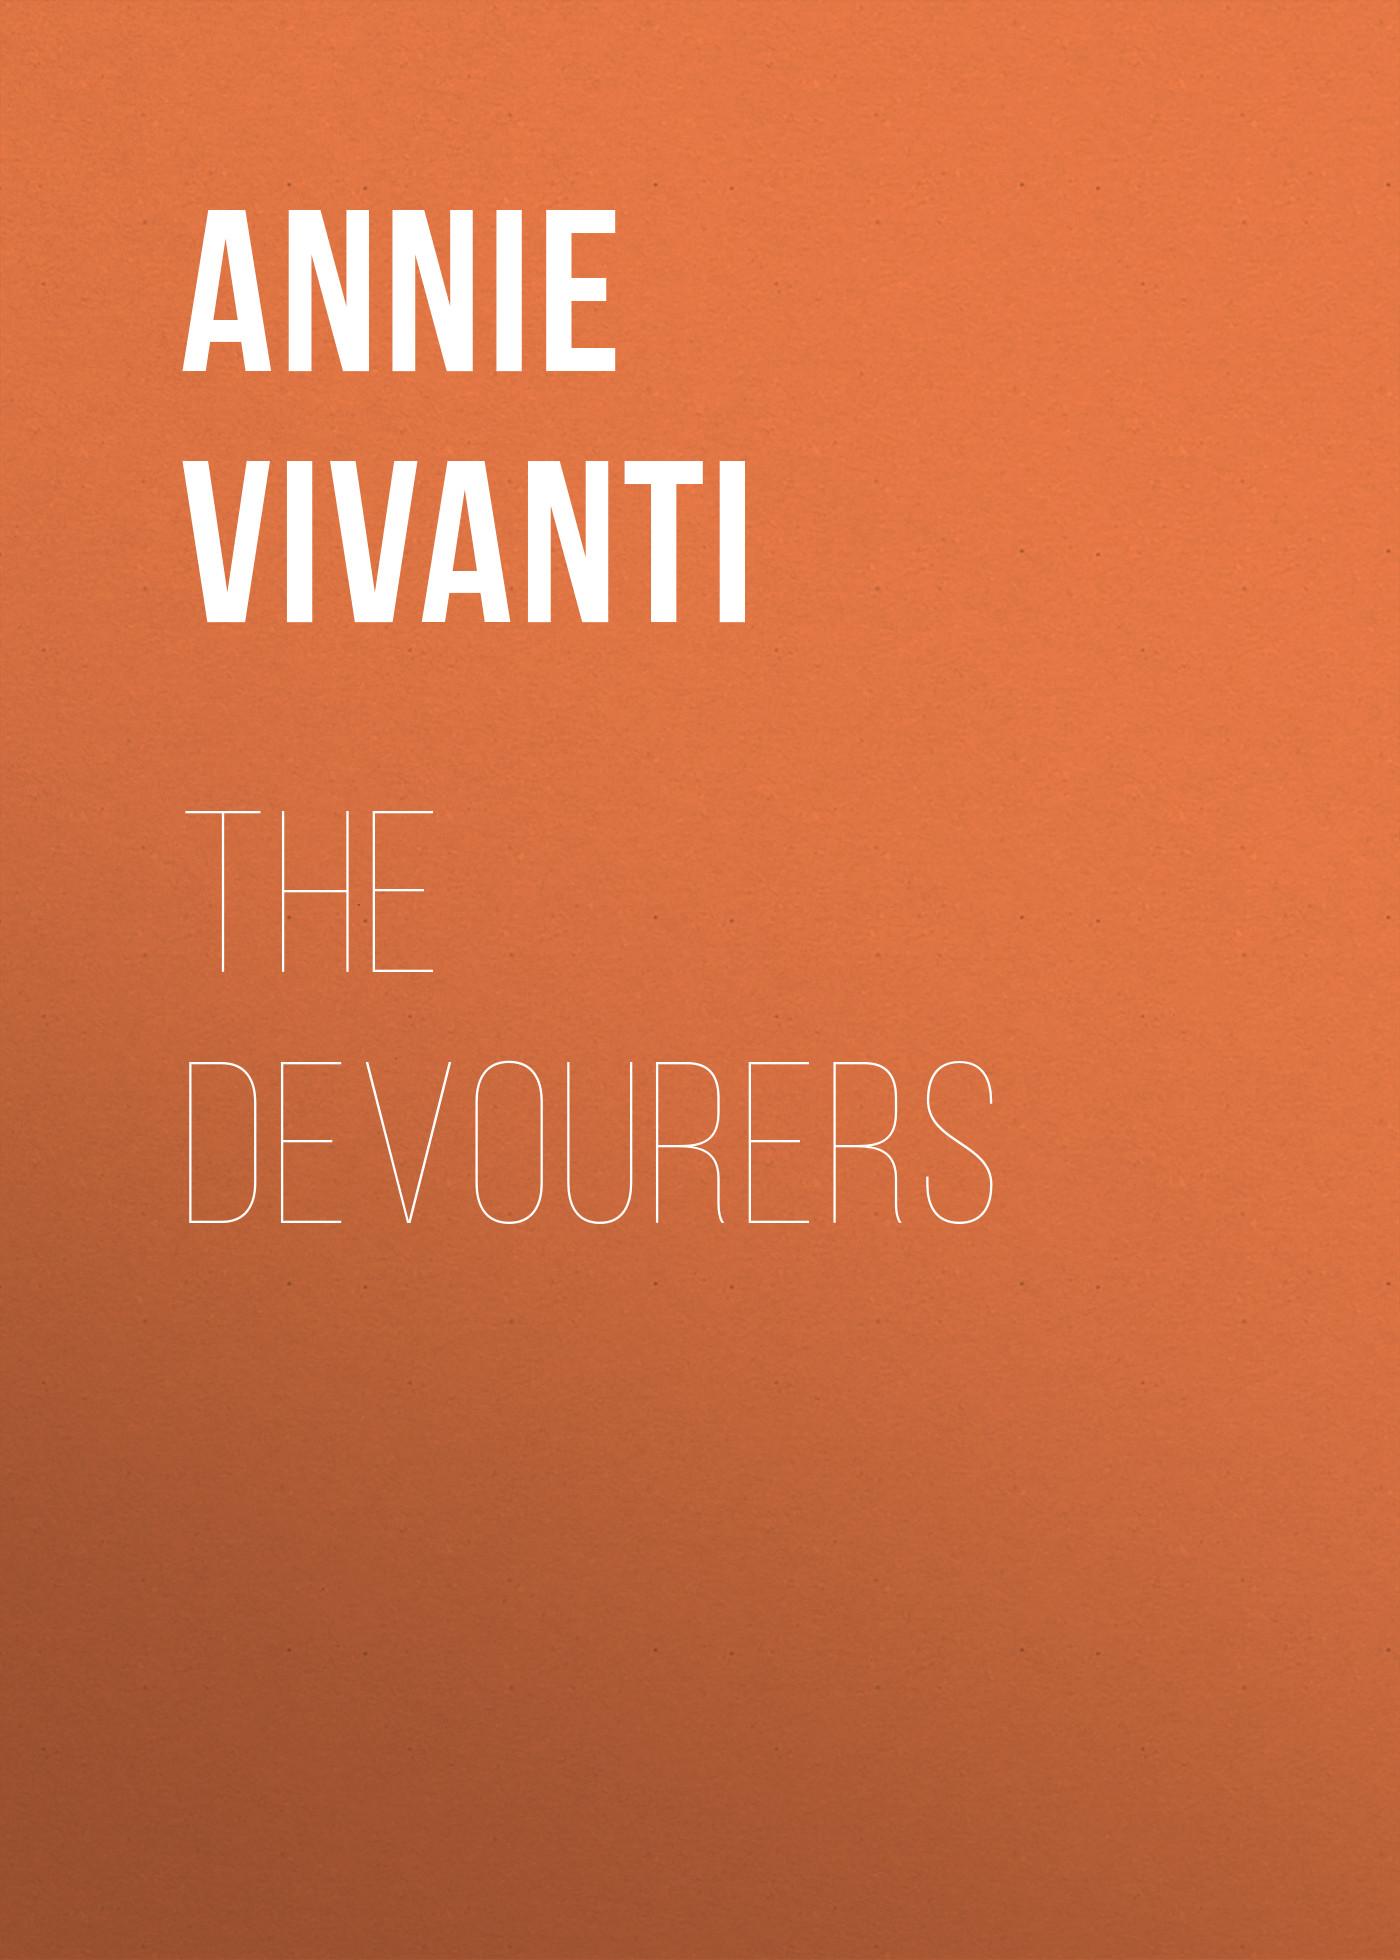 Annie Vivanti The Devourers annie vivanti gioia